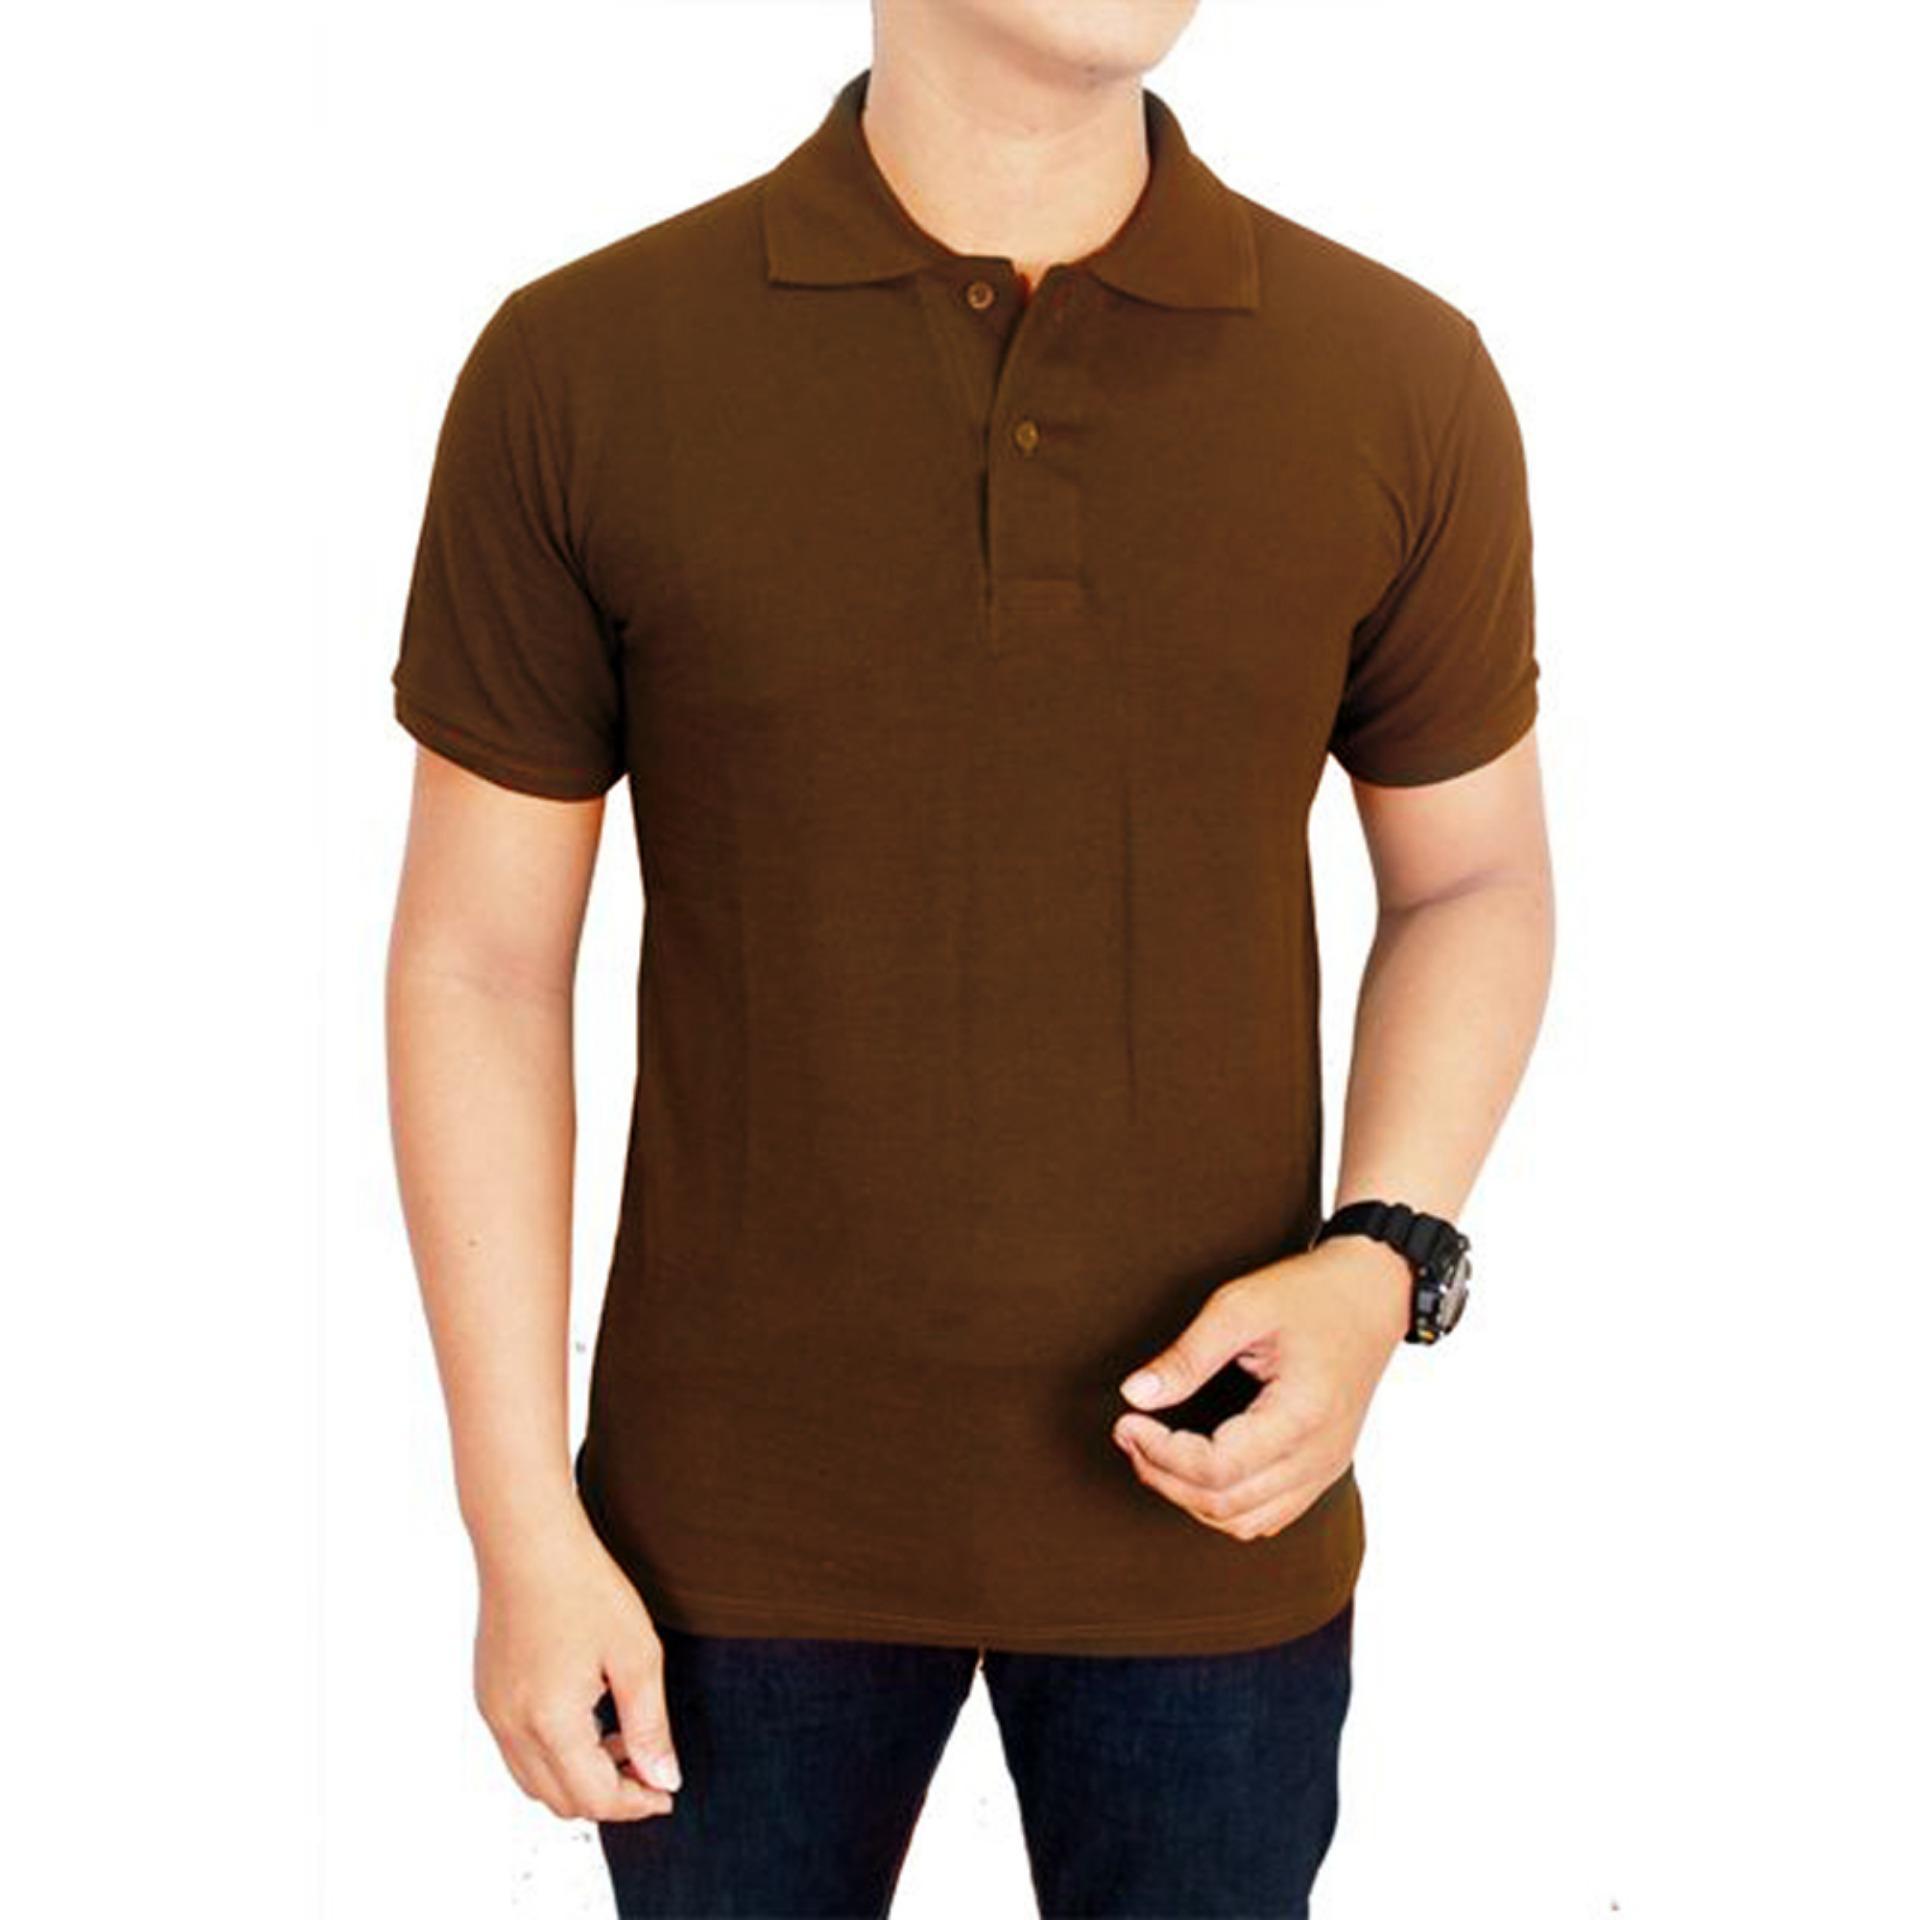 Baju Kaos Kerah Coklat Tua - SJ66 - Polo - Lacoste - Makario Maju